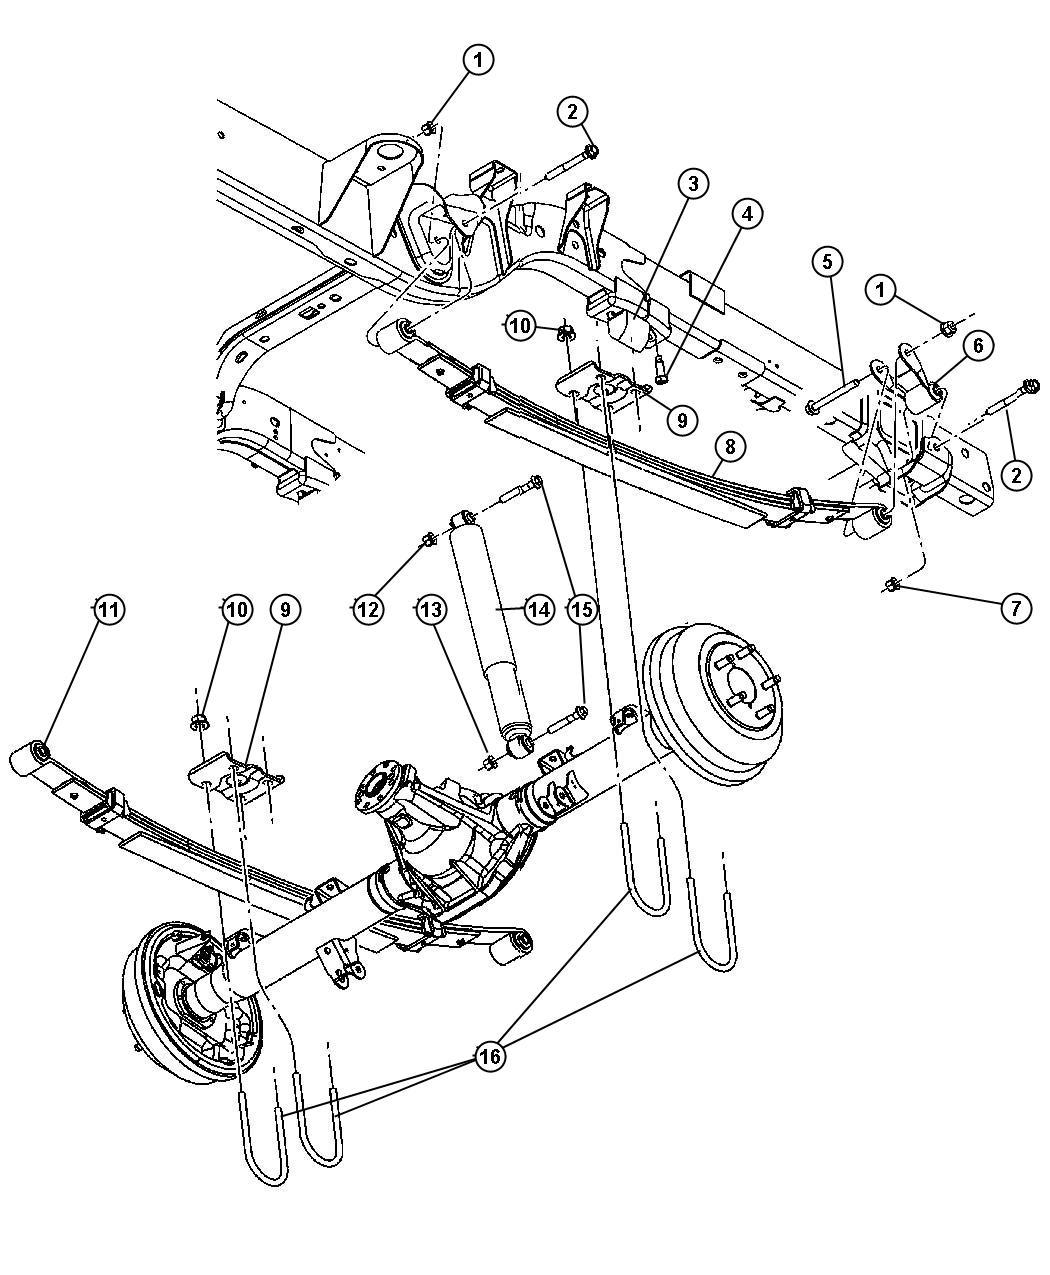 2001 Dodge Dakota CLUB CAB 6.5 FT BOX 4.7L V8 M/T Bumper